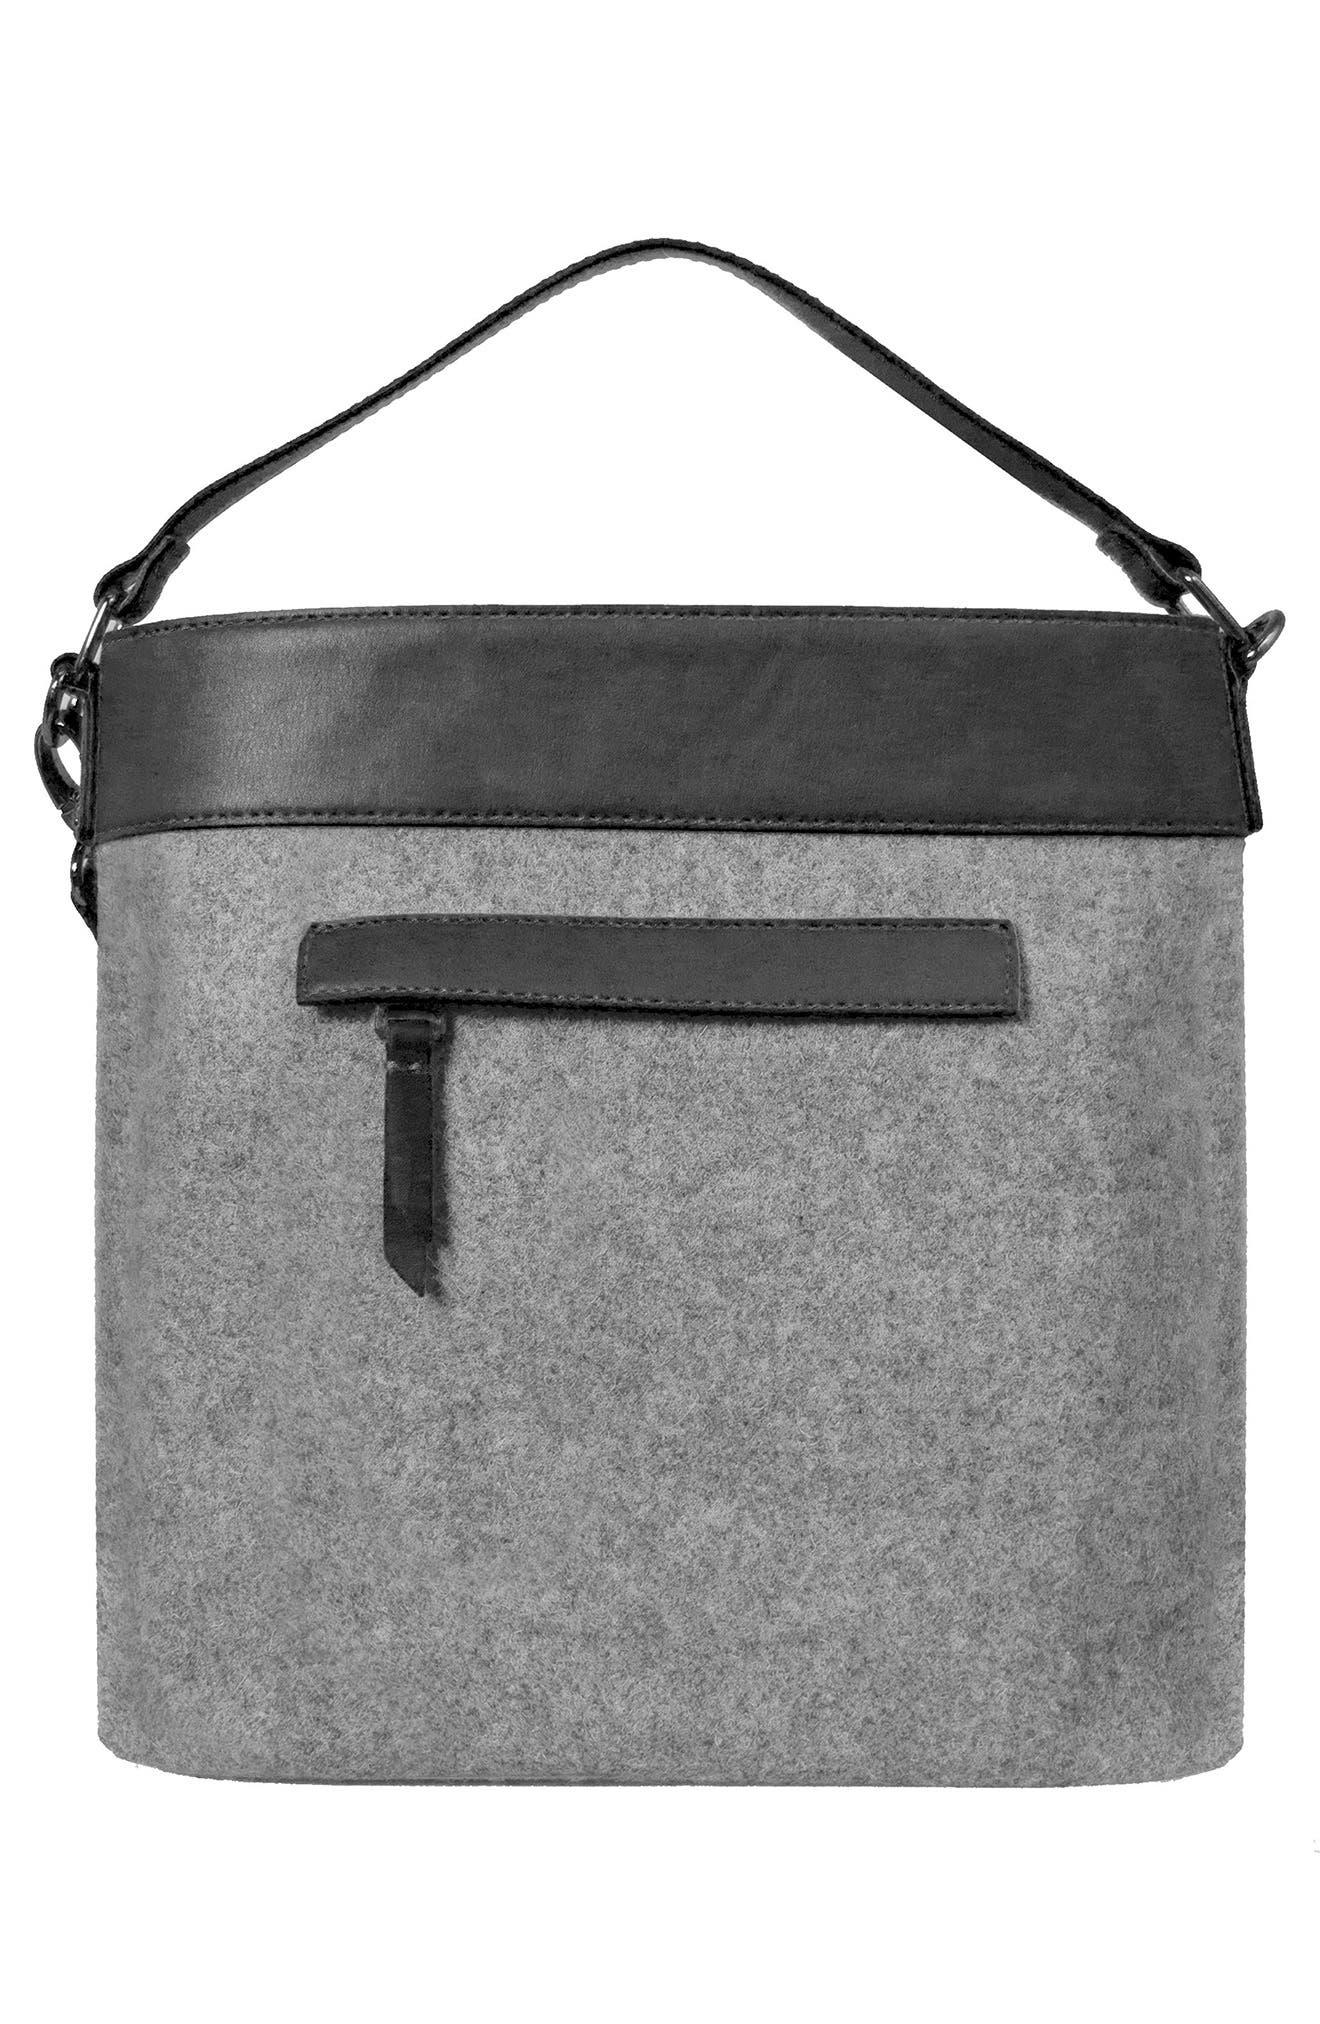 Boheme Wool & Leather Convertible Crossbody Bag,                             Alternate thumbnail 5, color,